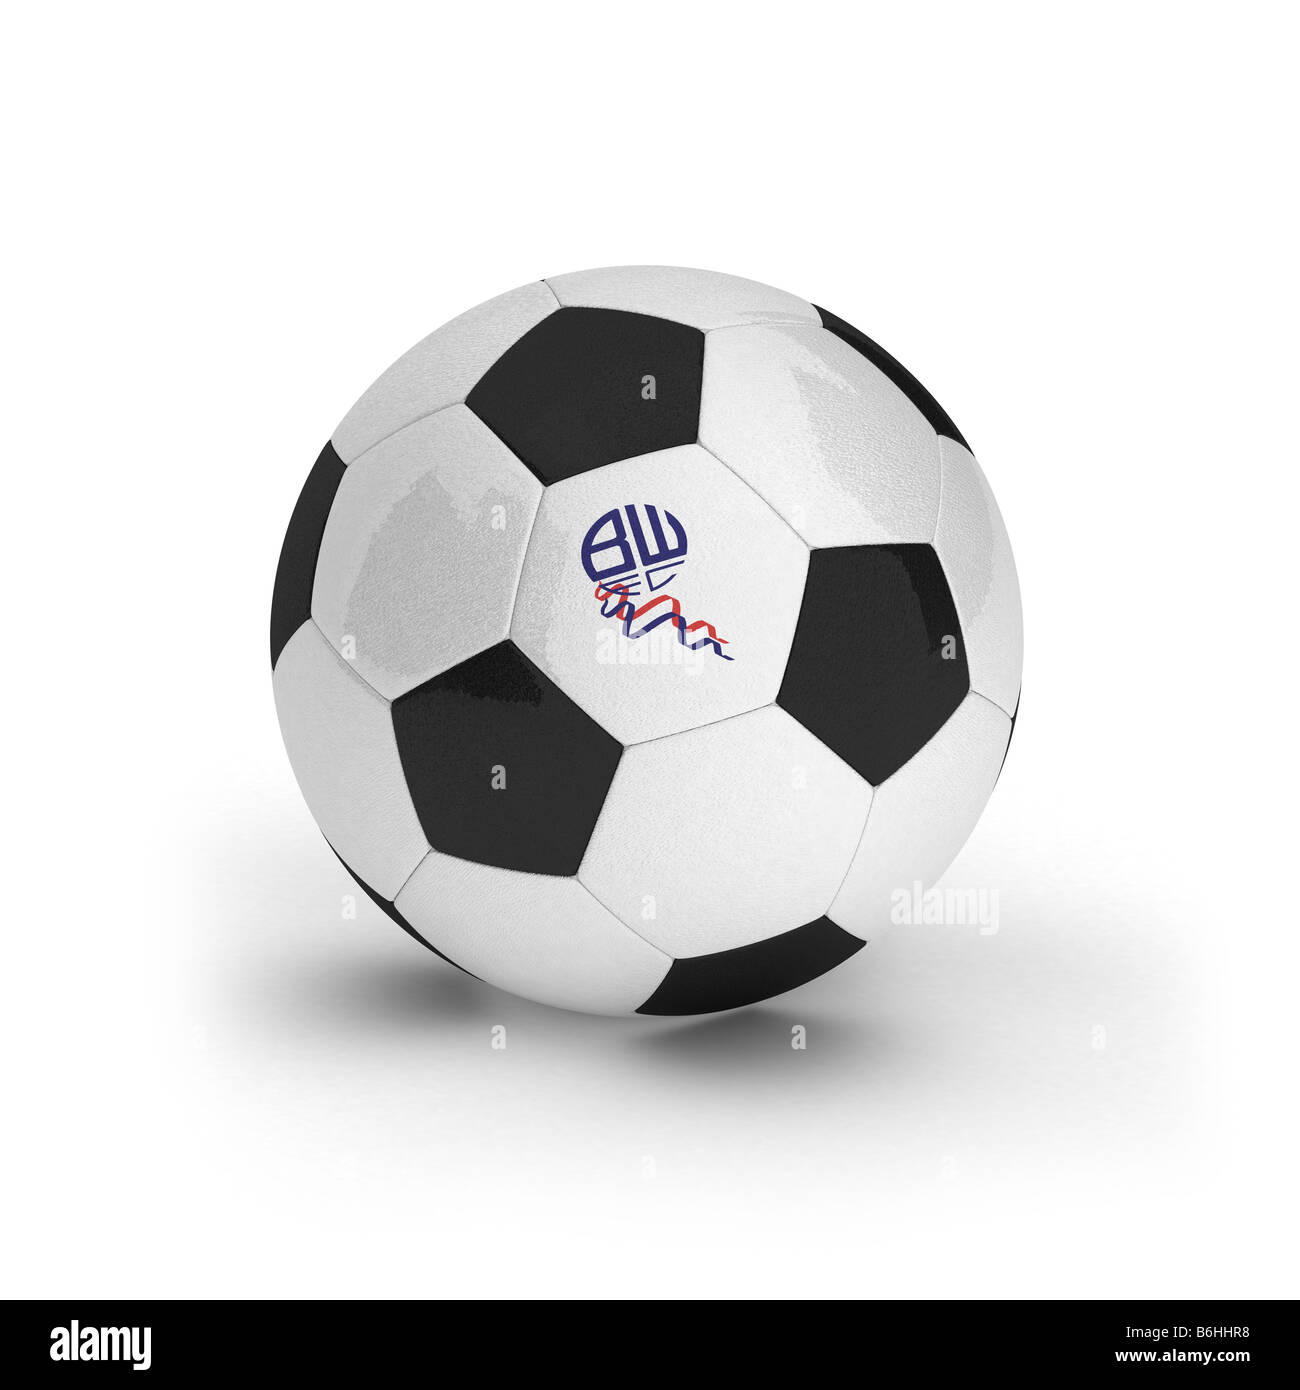 Bolton Wanderers Football - Stock Image